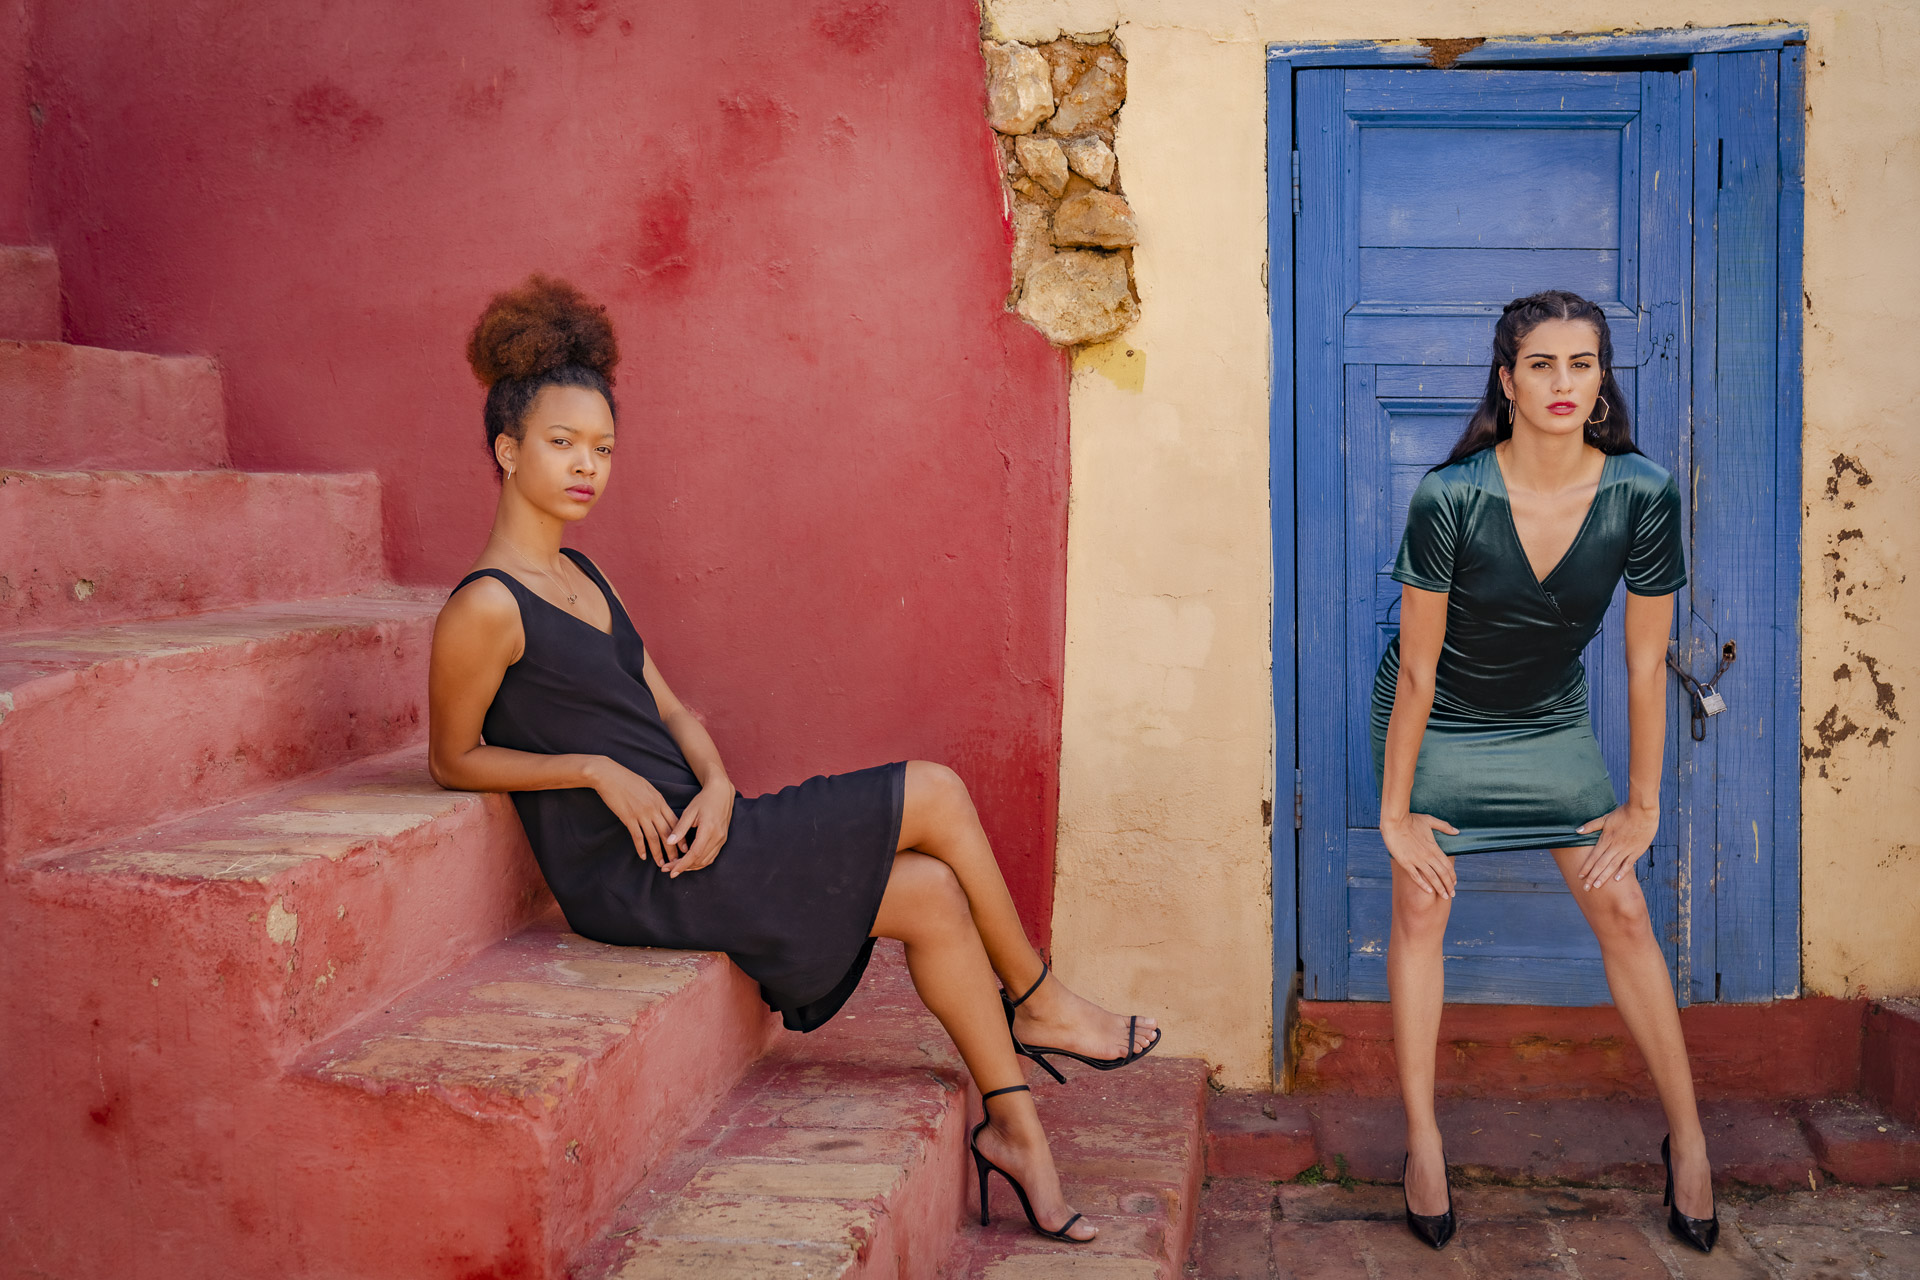 fotoreise-fotosafari-hd-2021-098-Kuba